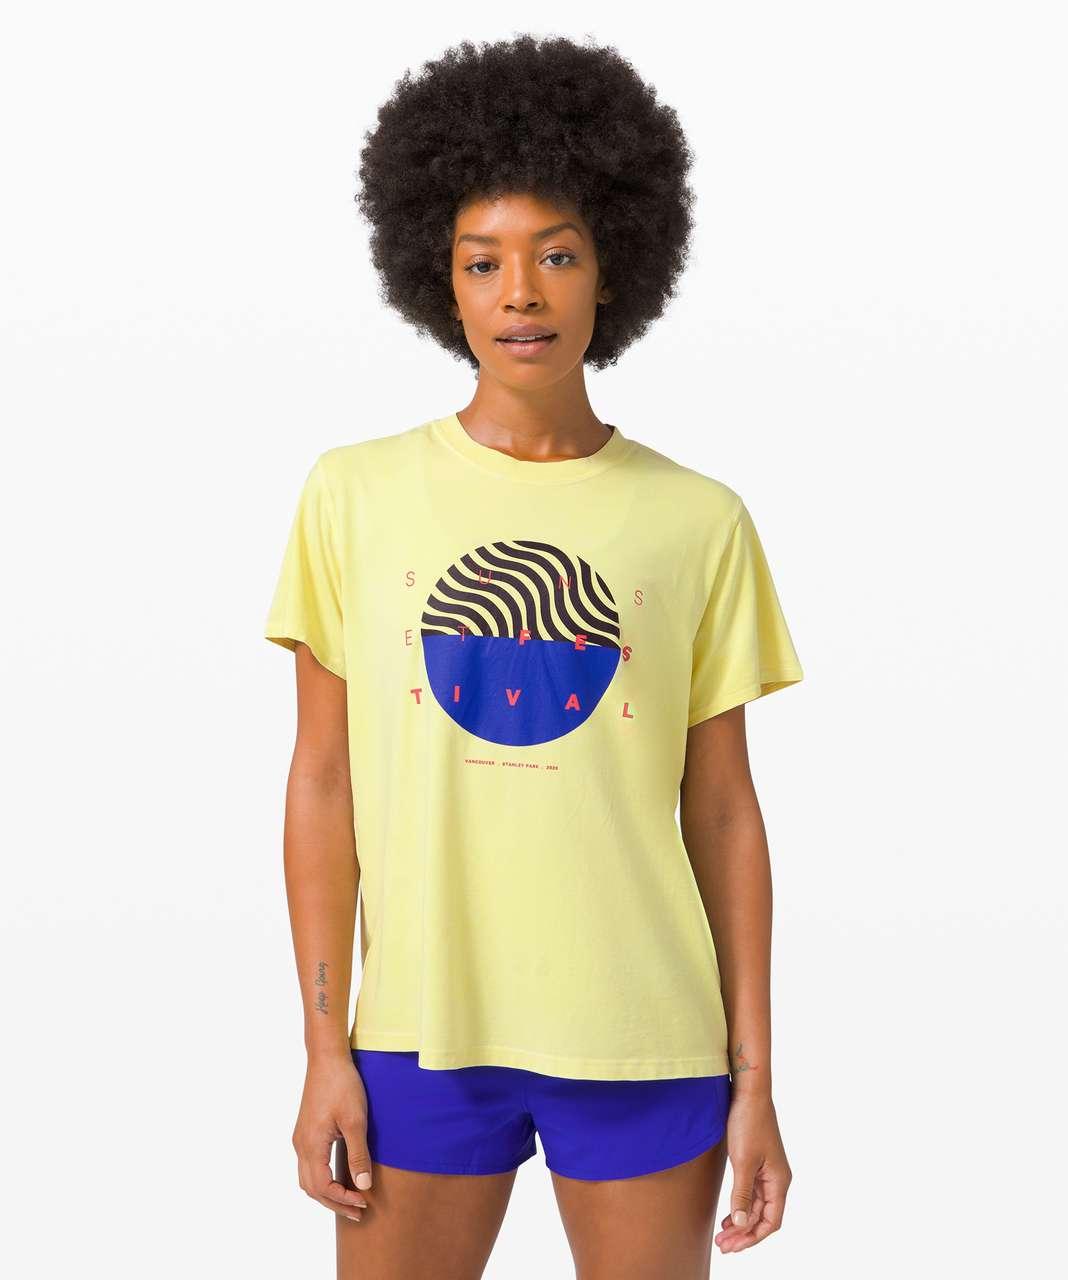 Lululemon All Yours Tee *SeaWheeze - Crackle Wash Sunlight Yellow